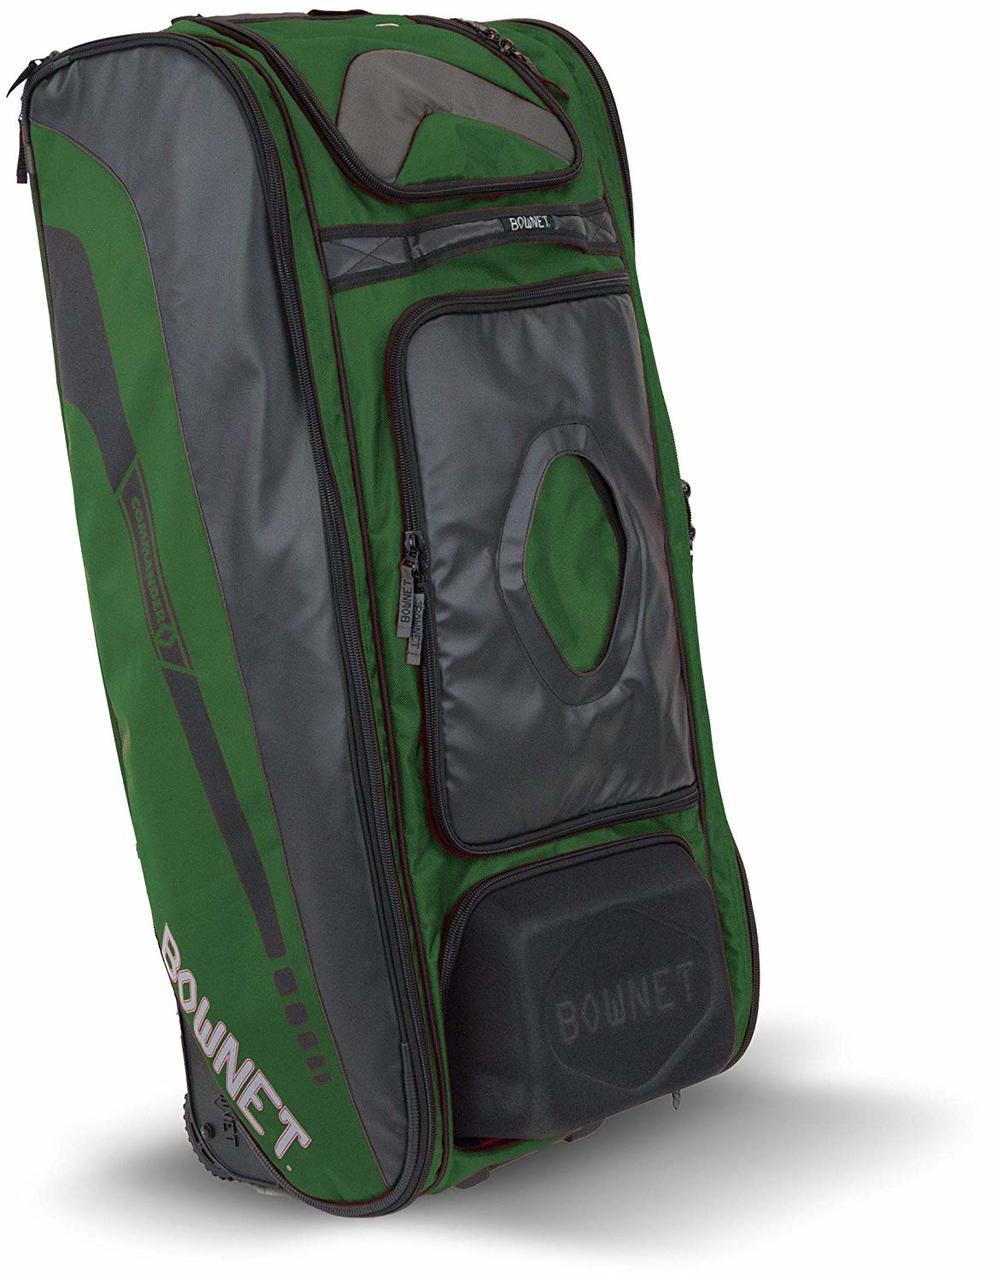 Bownet Commander Dark Green Catchers Bag Bn Commander Bag Dg